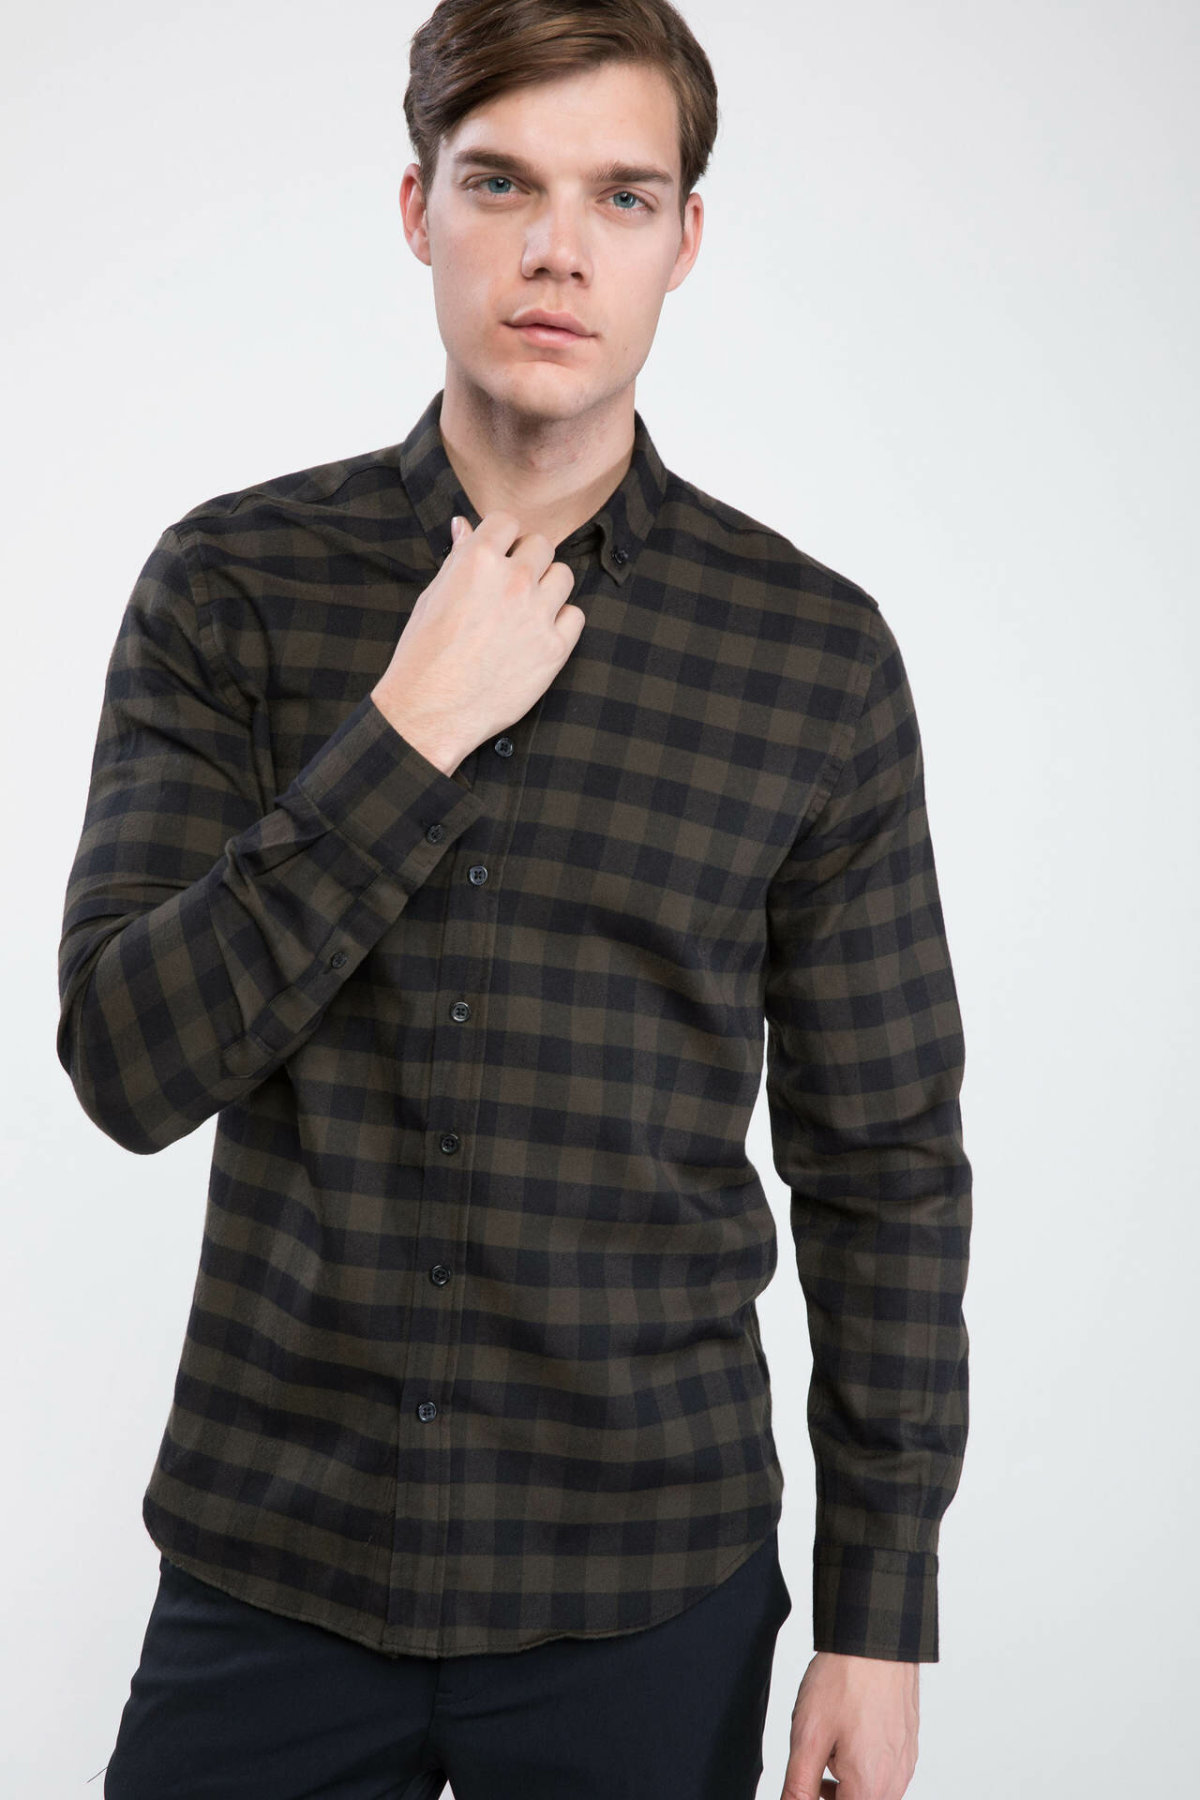 DeFacto Man Plaids Cotton Shirts Men Turn-down Collar Autumn Dark Color Grids Shirts Long Sleeve Top Shirt-J3734AZ18WN